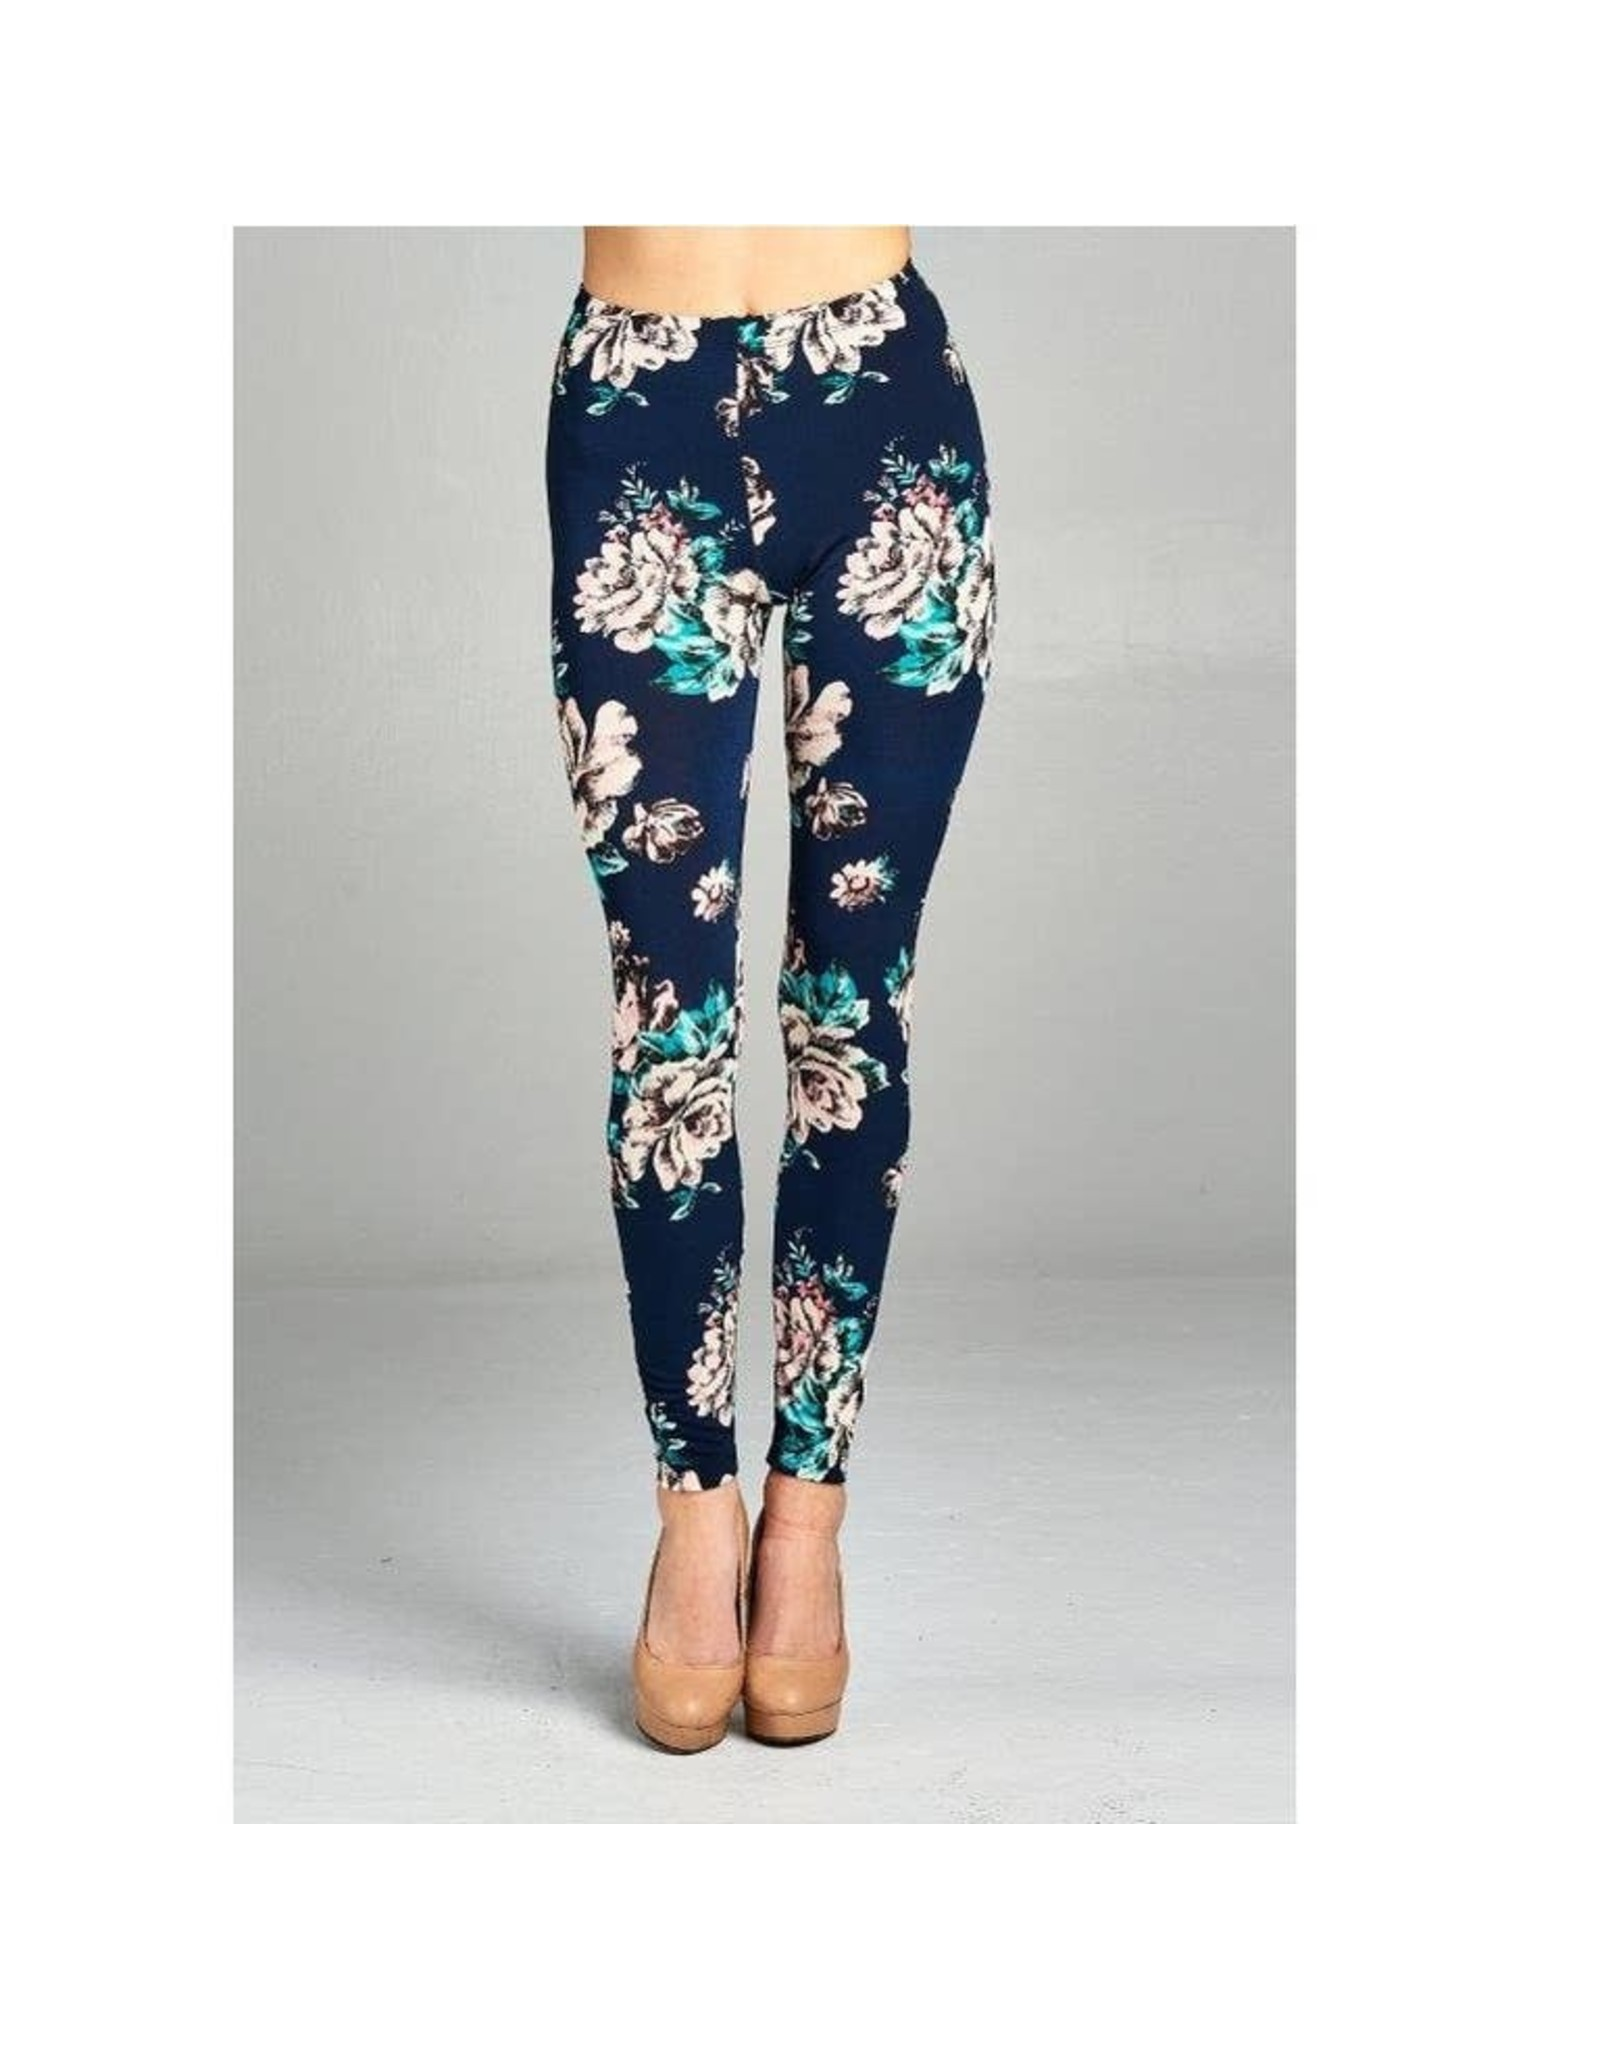 LKLUV Floral Leggings